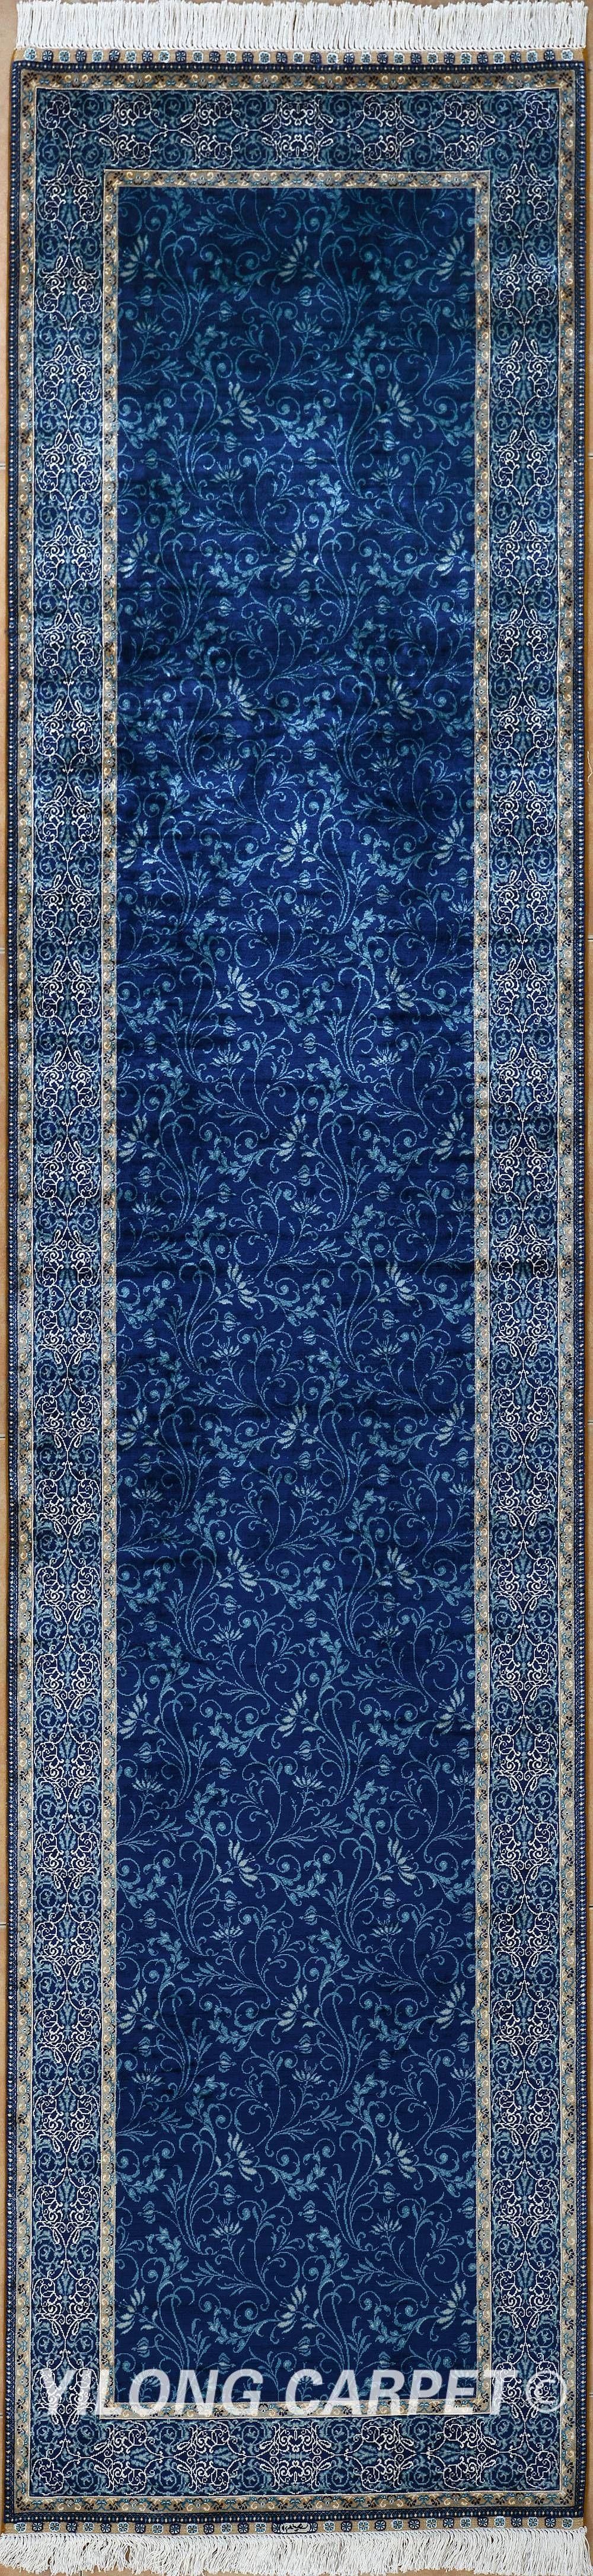 Persian Rug Oriental Turkish Carpet Silk Tabriz Rugs Hereke Area Materials Technology Pink Beigeblue Yellowcolor